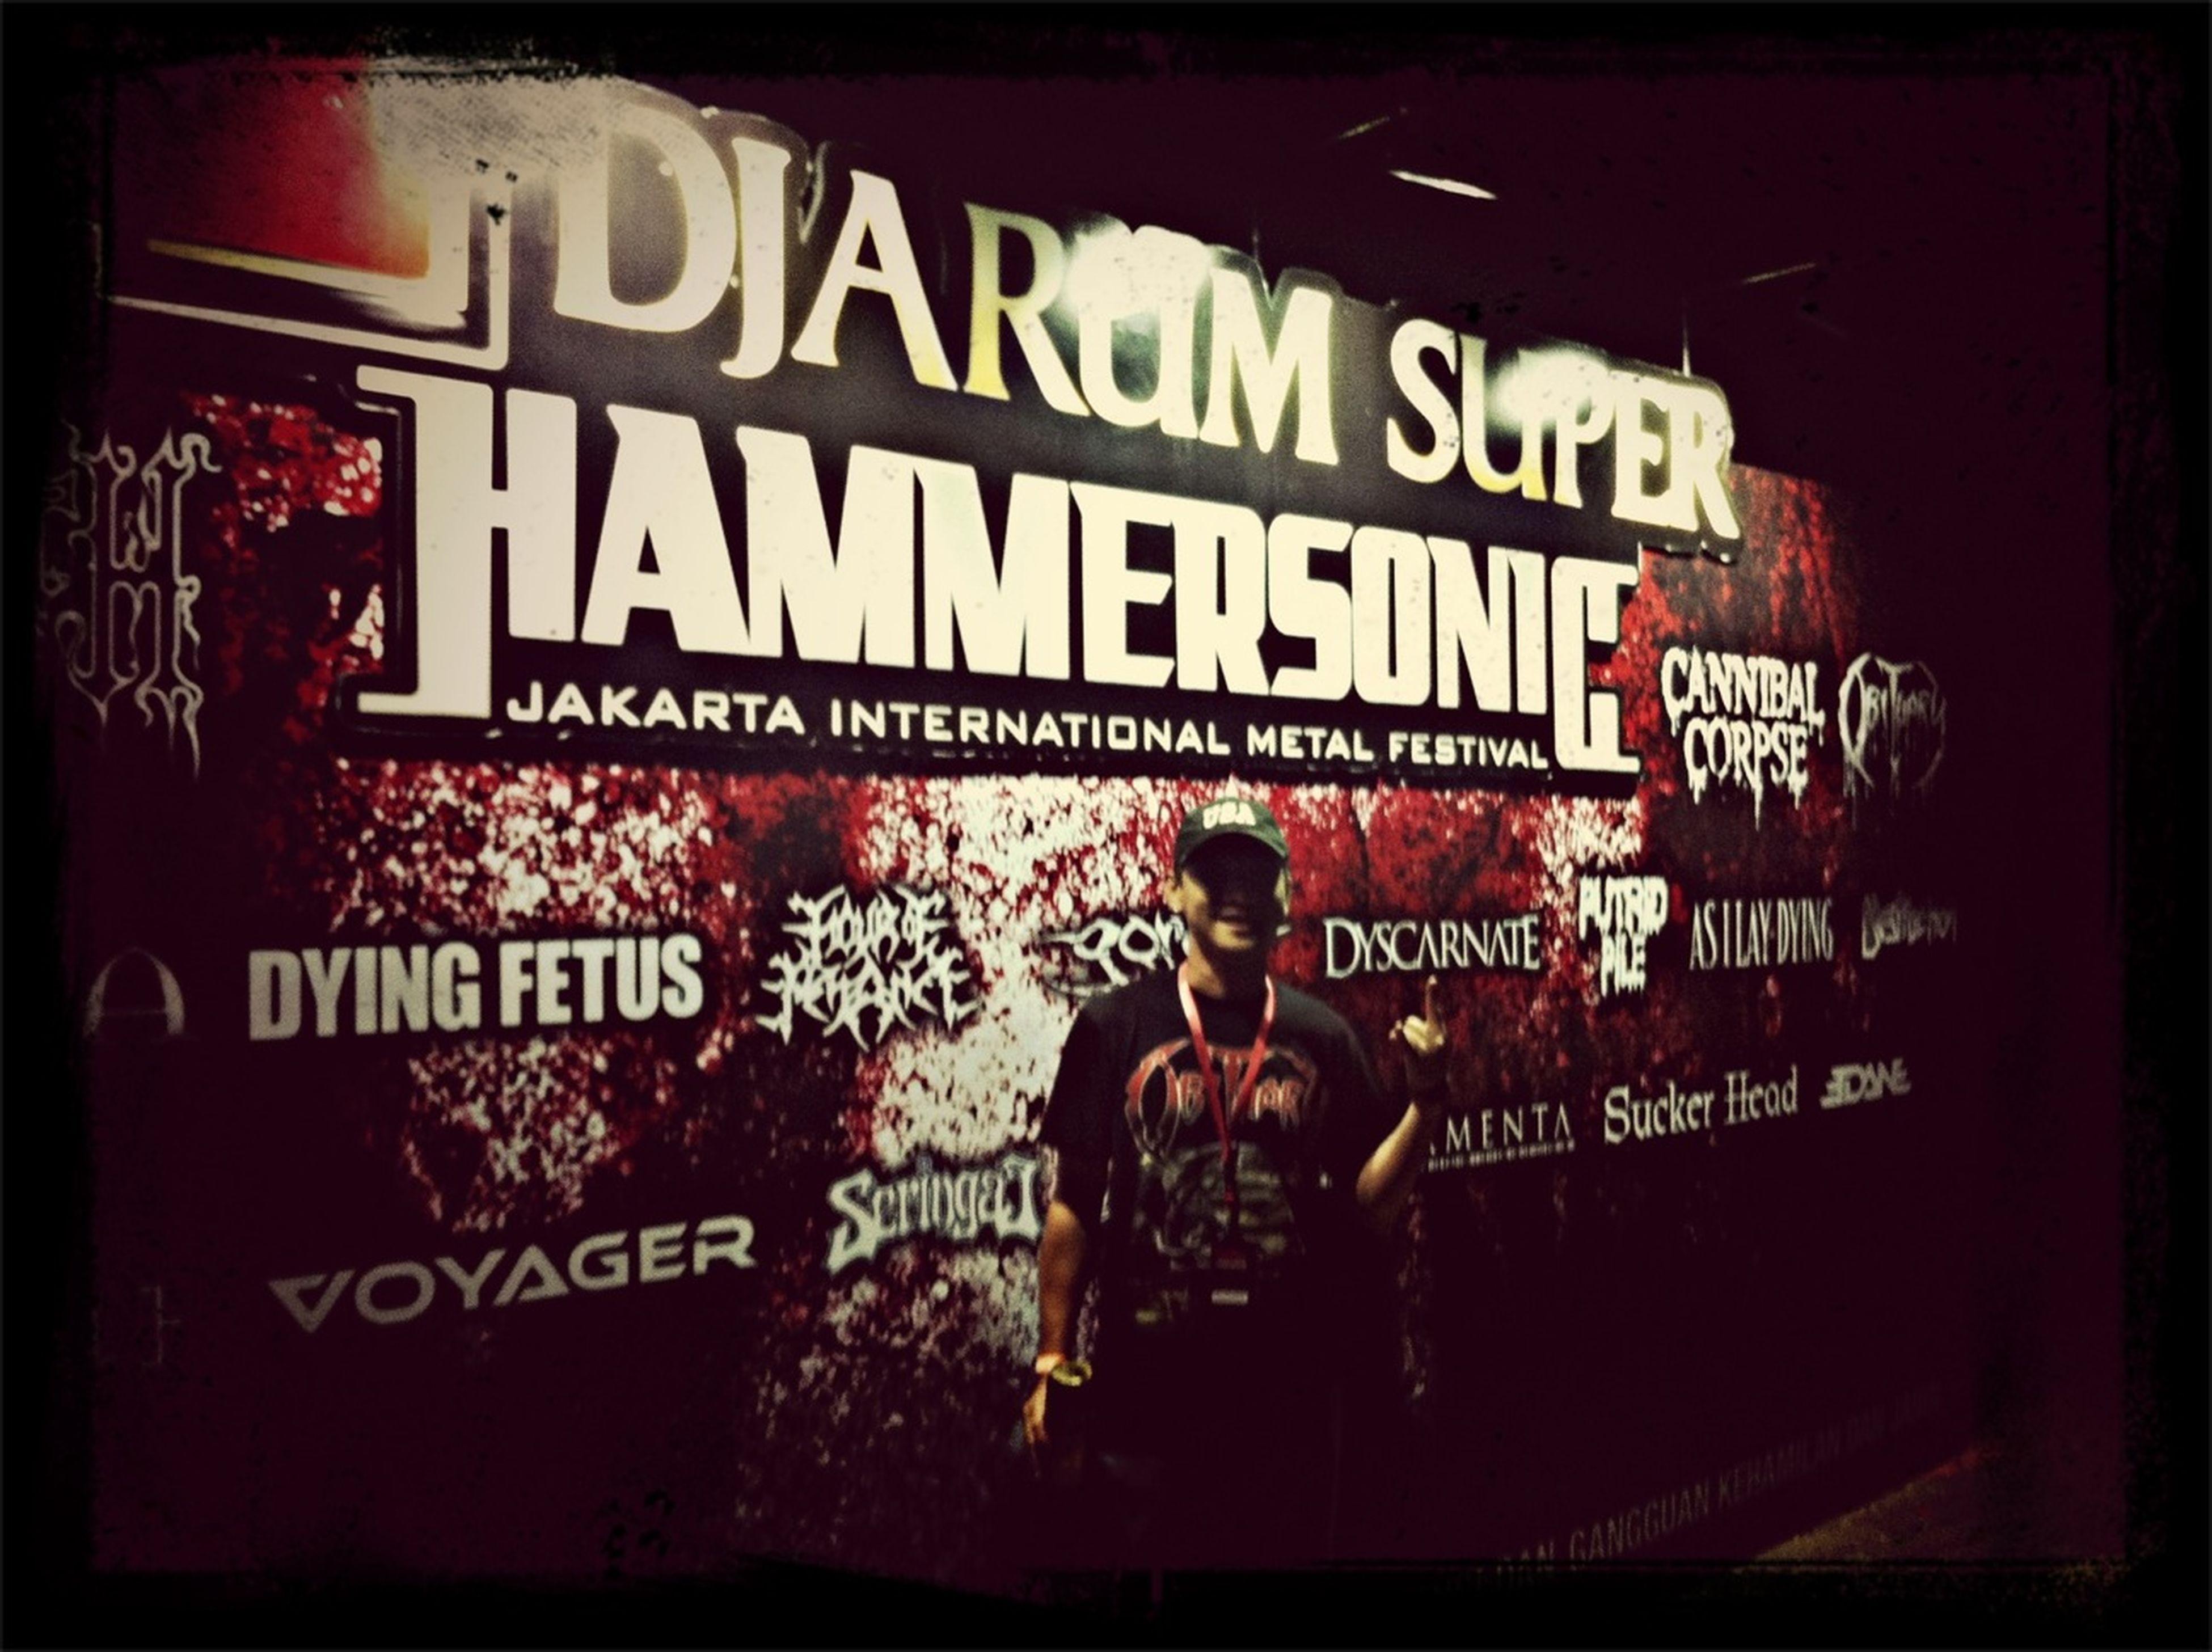 Heading Hammersonic2013